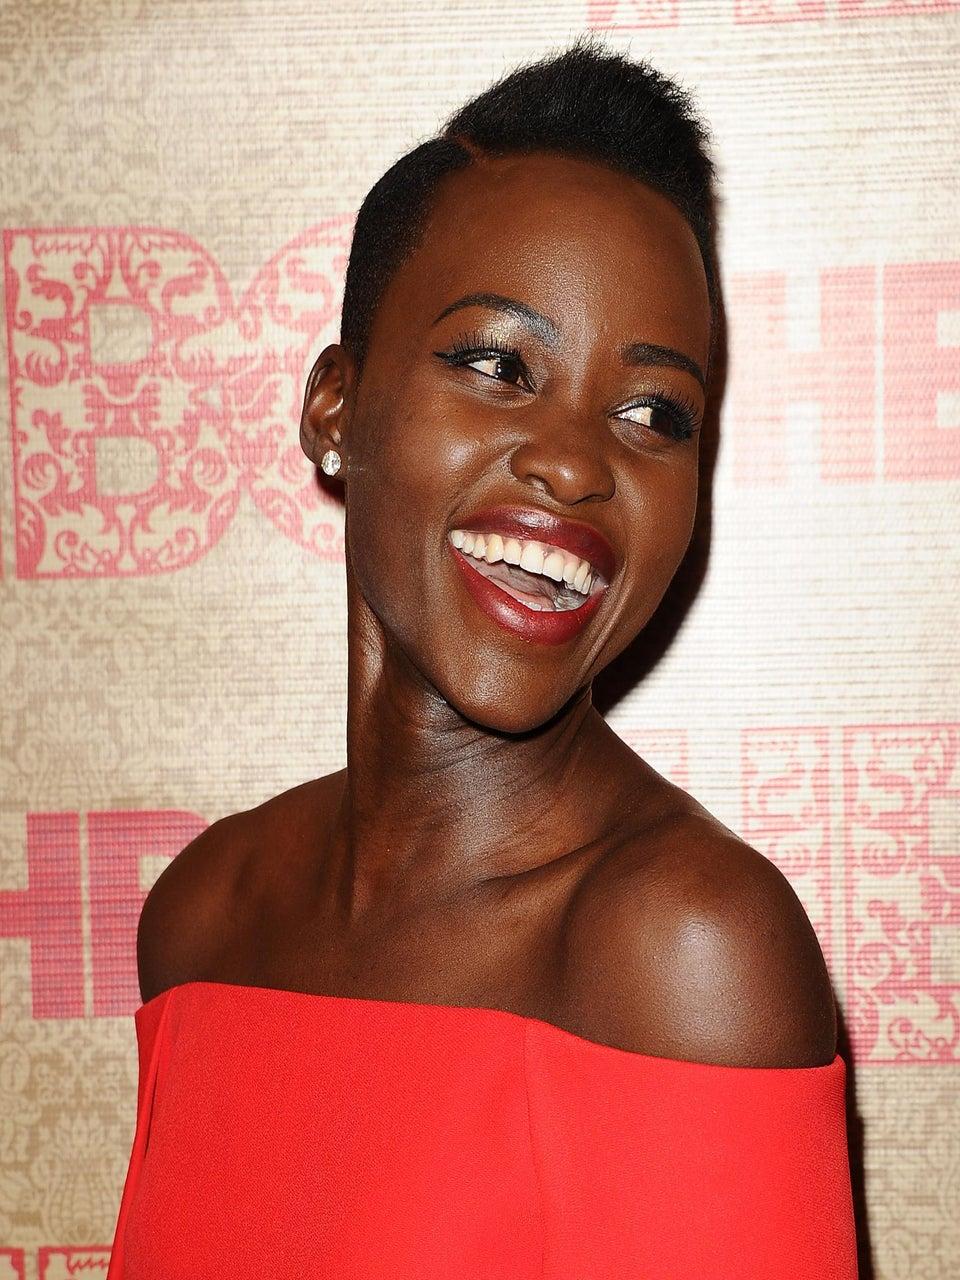 Lupita Nyong'o, Chiwetel Ejiofor, '12 Years a Slave' Score Oscar Nominations